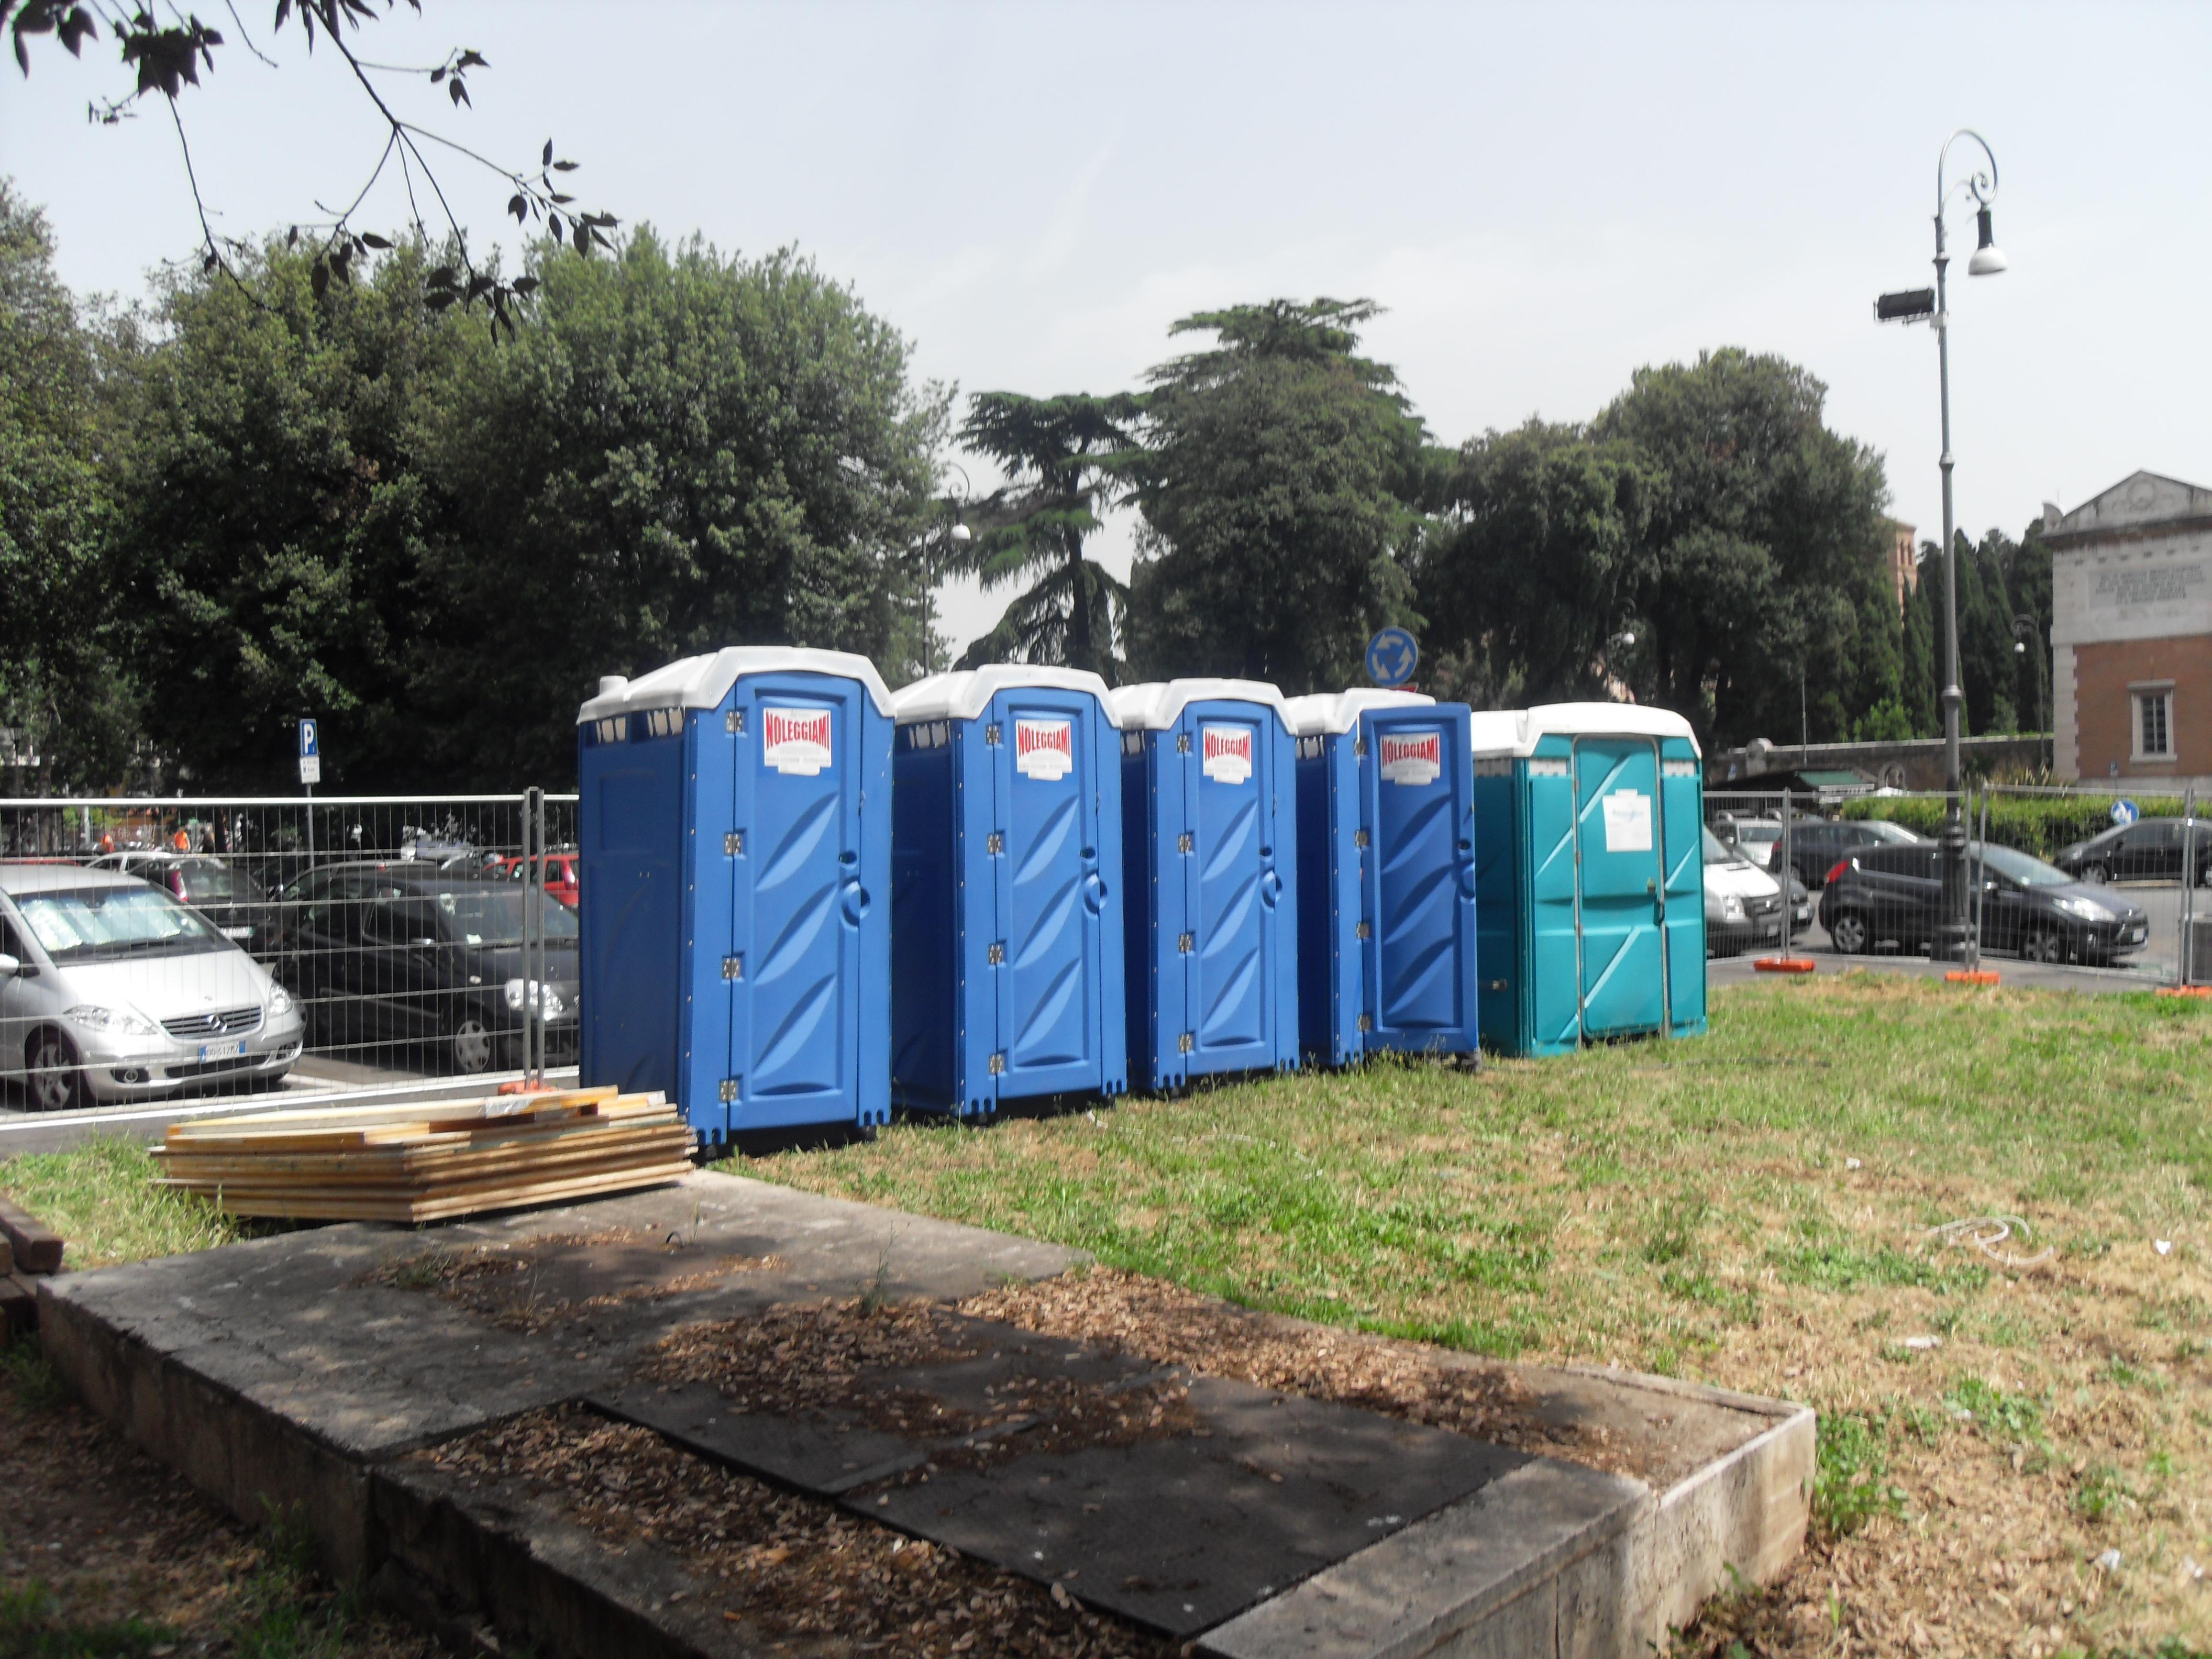 NOLEGGIO BAGNI CHIMICI ROMA - NOLEGGIO BAGNI CHIMICI ROMA